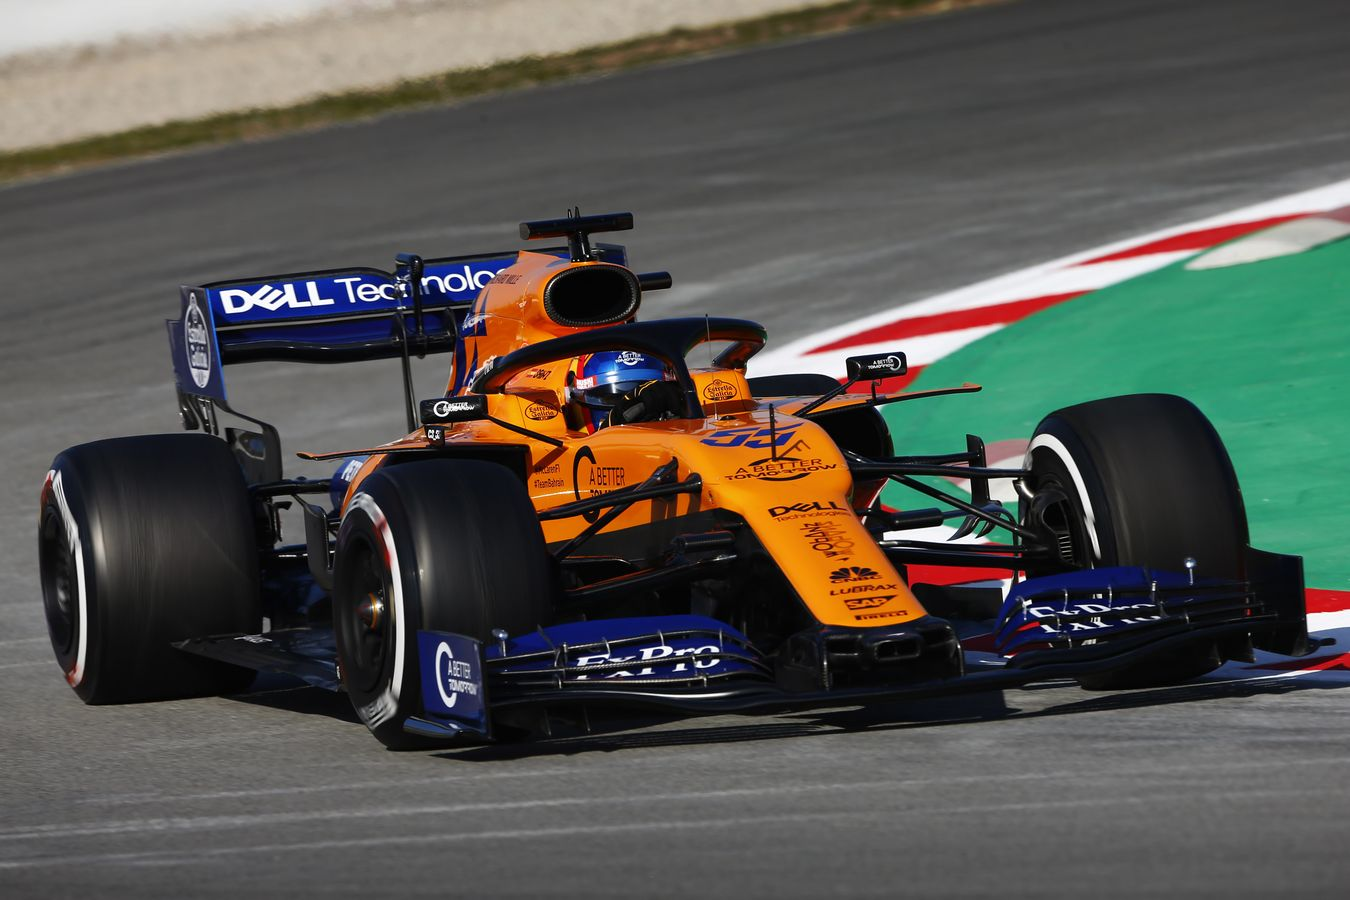 Hamilton holds off Vettel at 2017 Formula 1 Belgian Grand Prix  |Formula 1